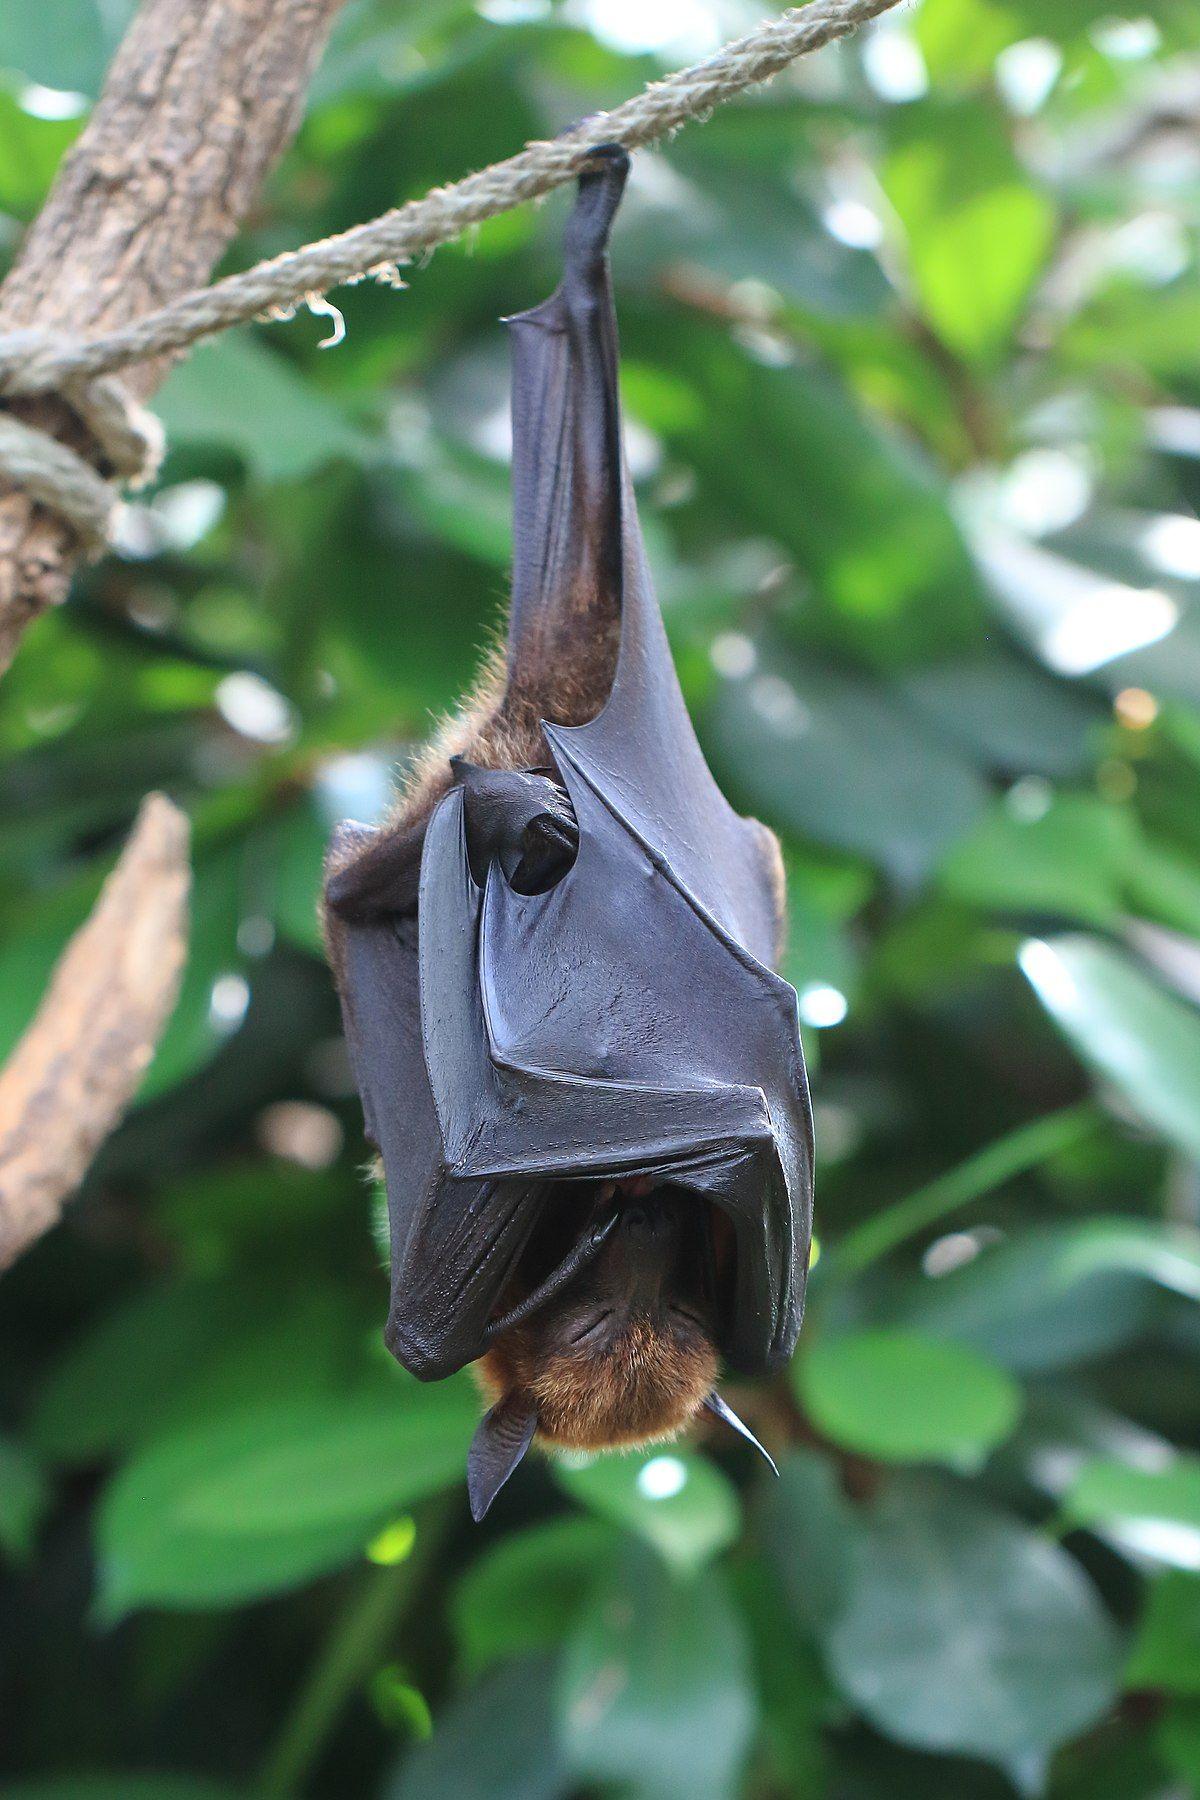 Megabats おしゃれまとめの人気アイデア Pinterest Cris コウモリ 蝙蝠